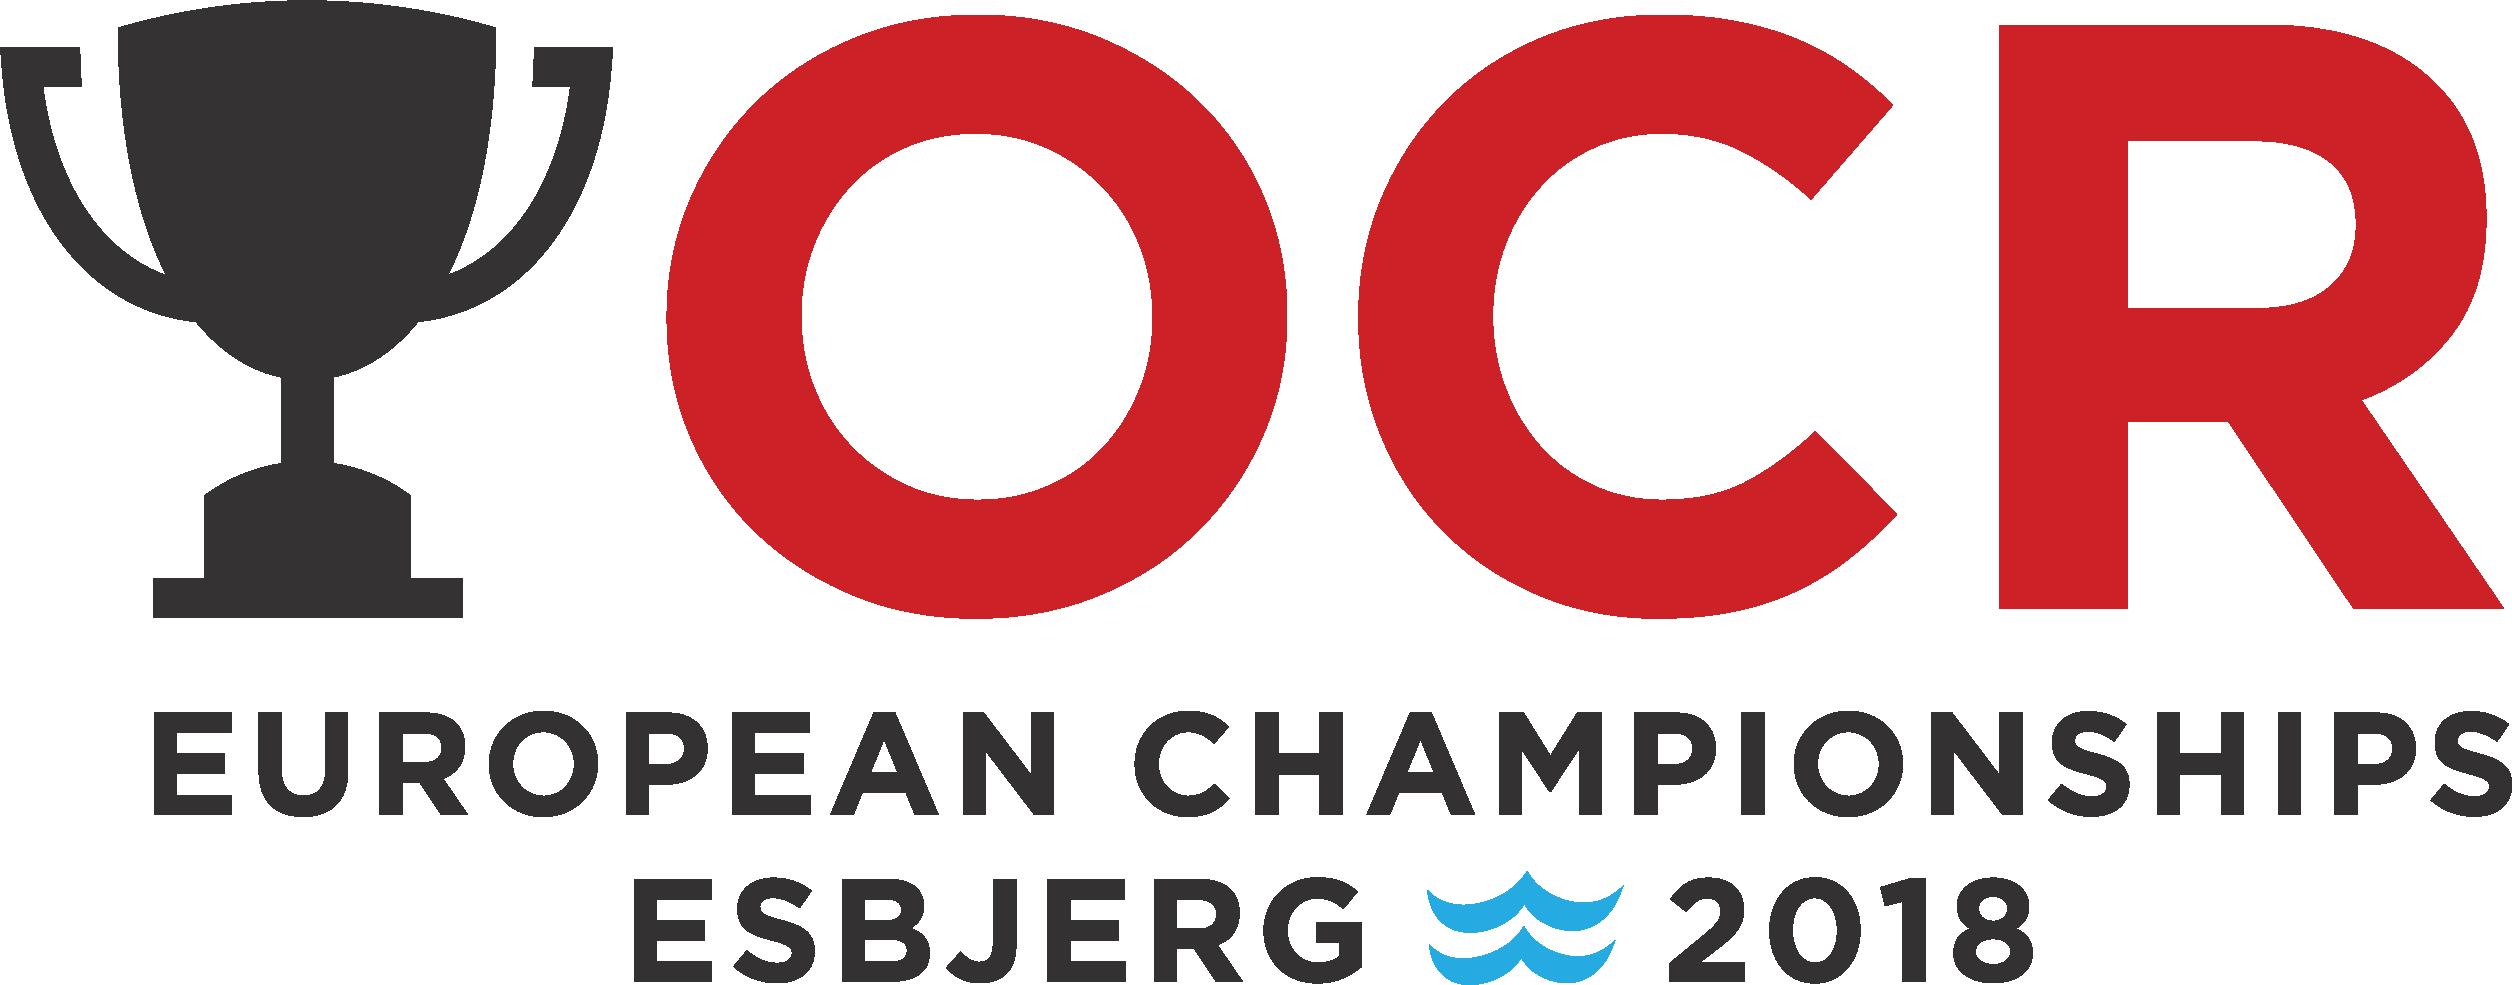 OCR European Championships